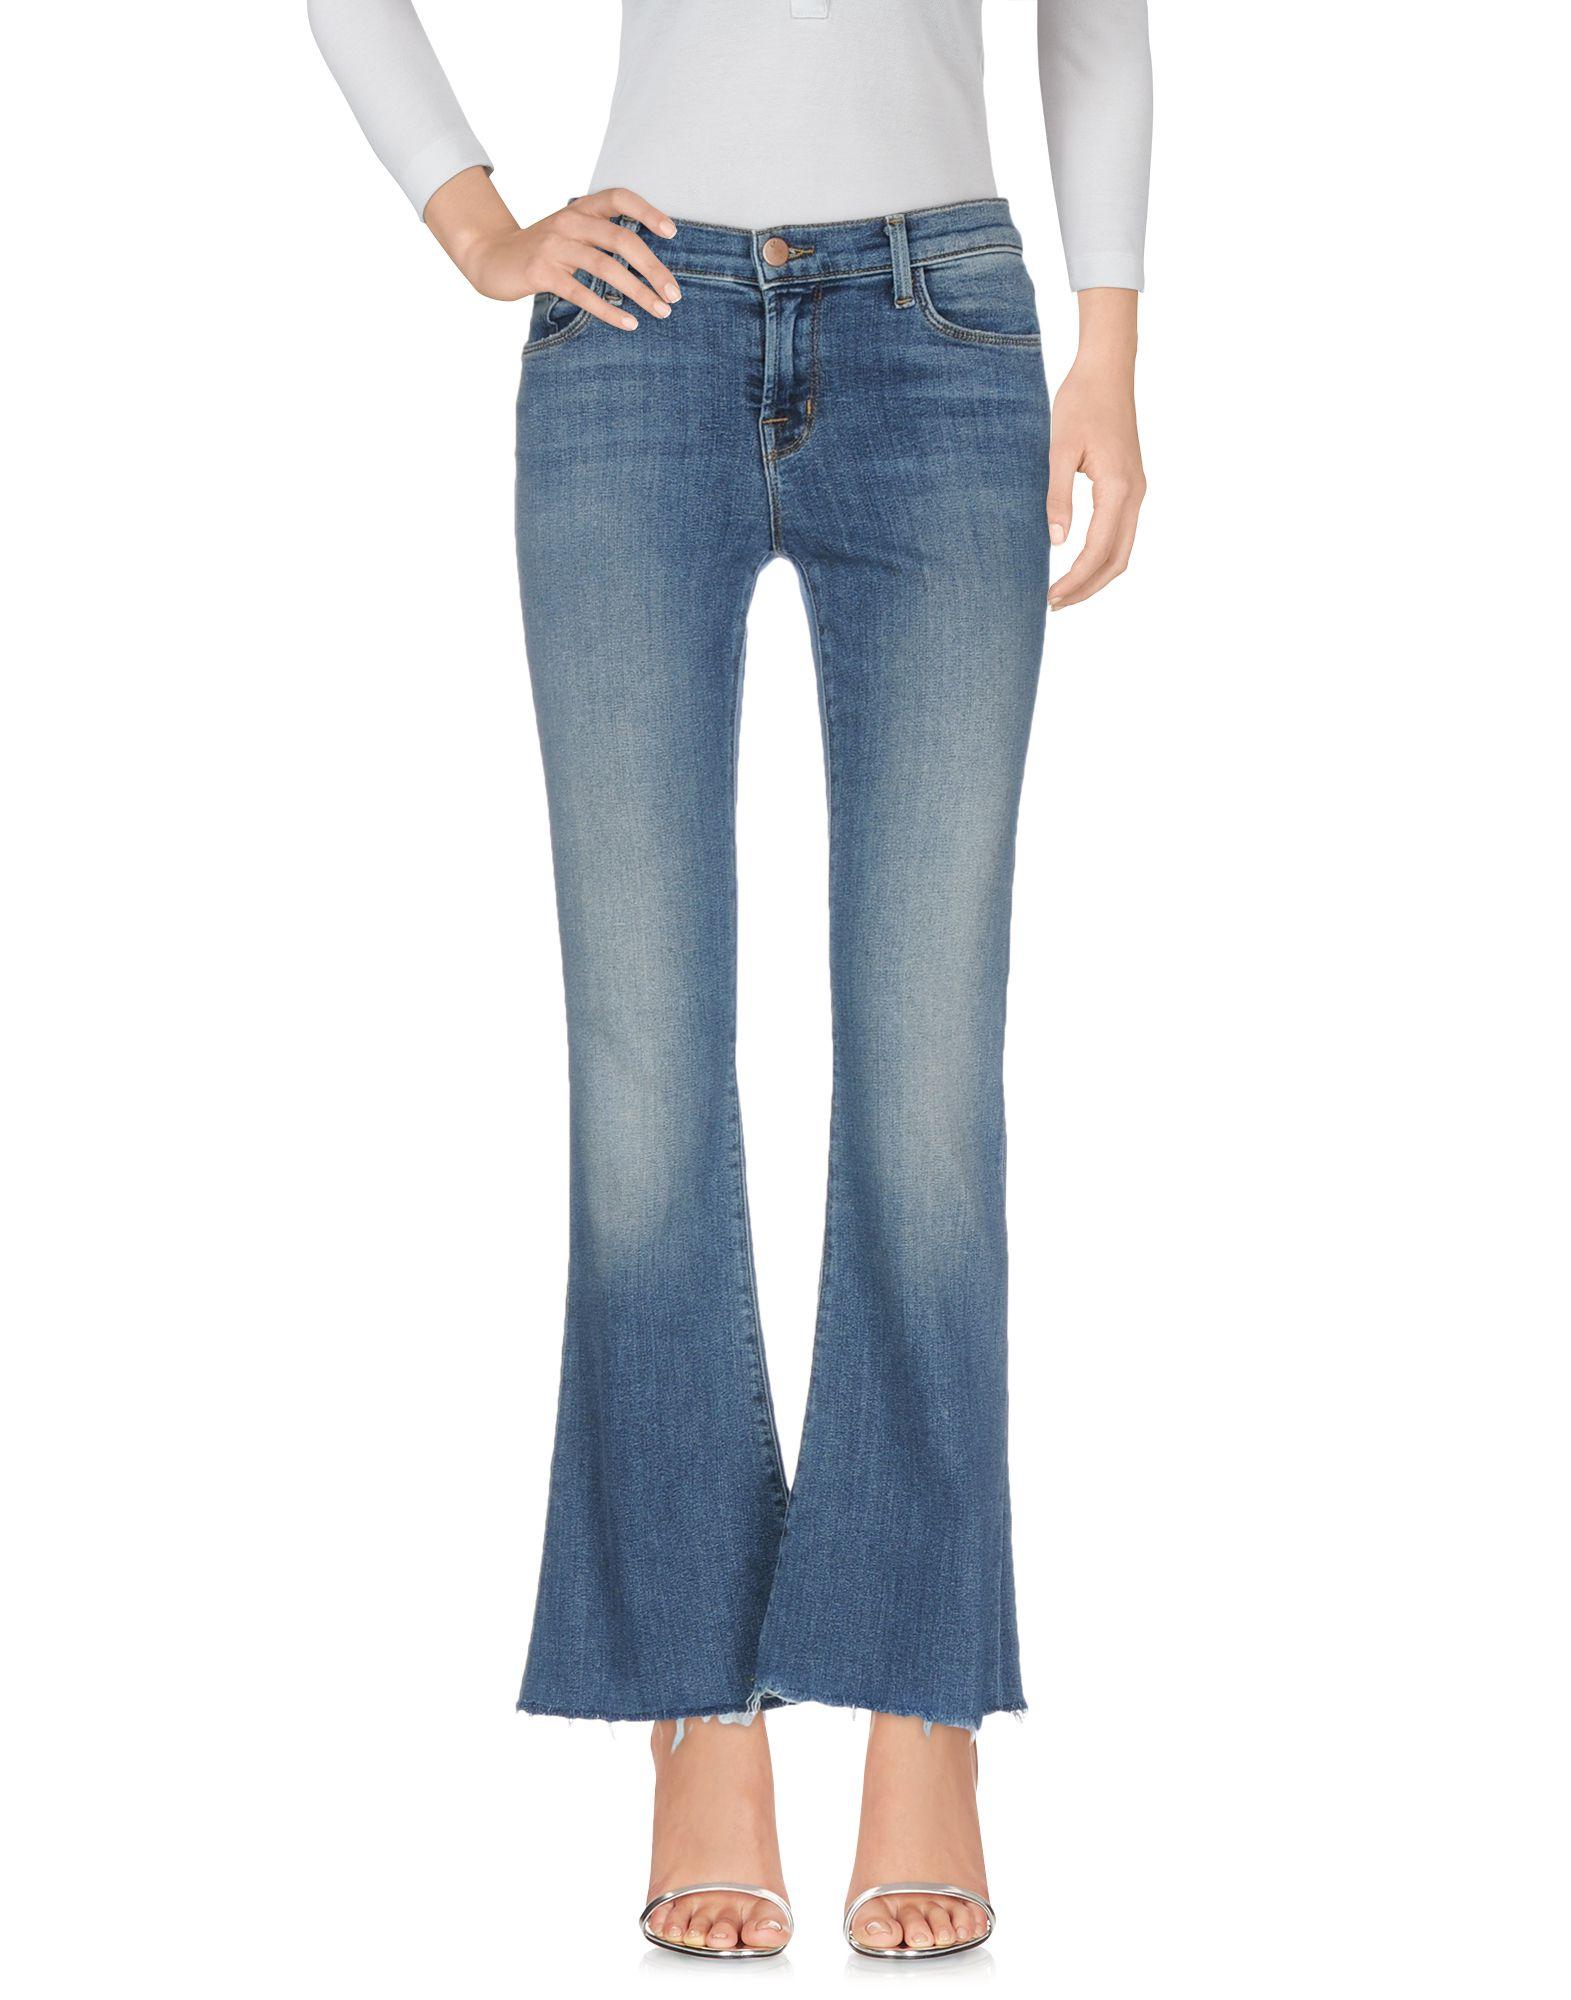 Pantaloni Jeans J Brand Donna - Acquista online su pF81oJLt